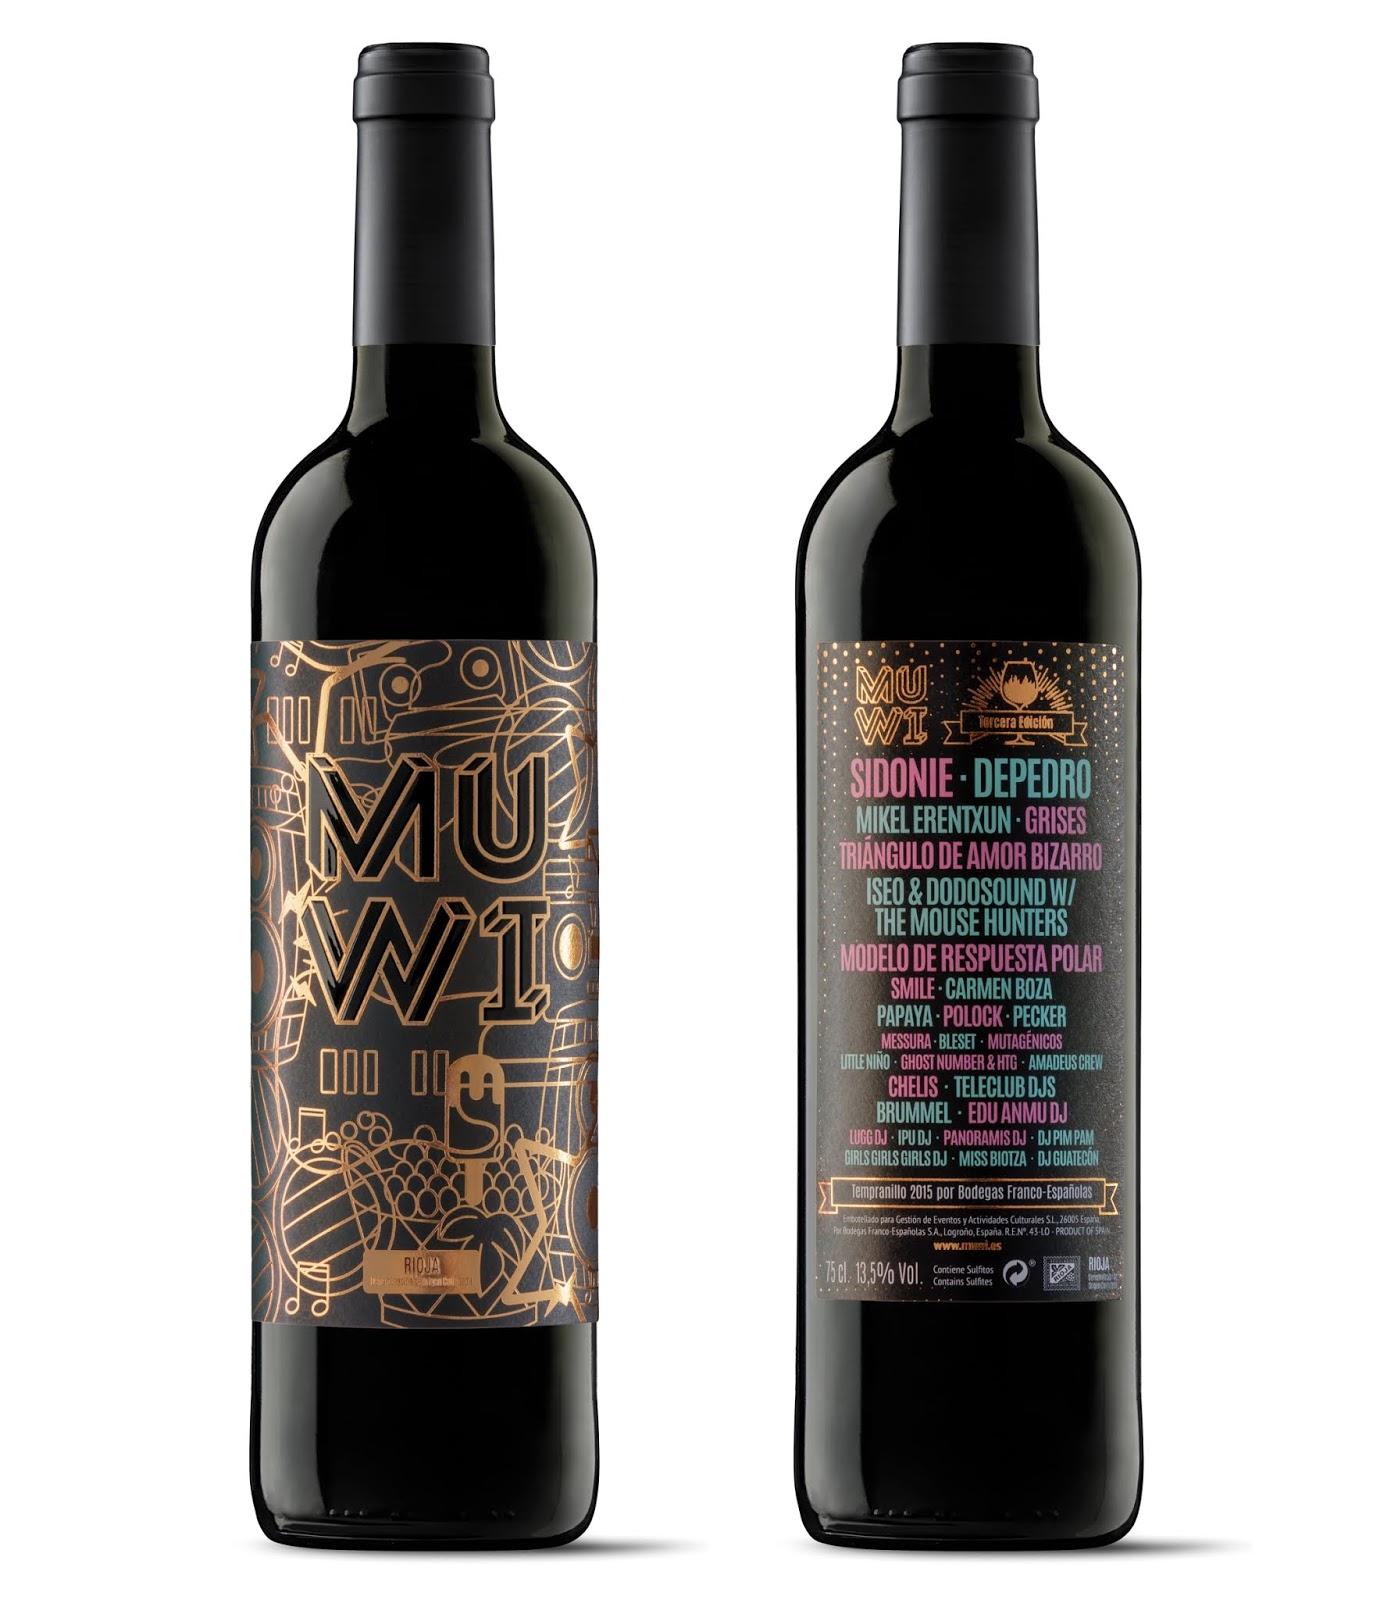 MUWI葡萄酒包装设计